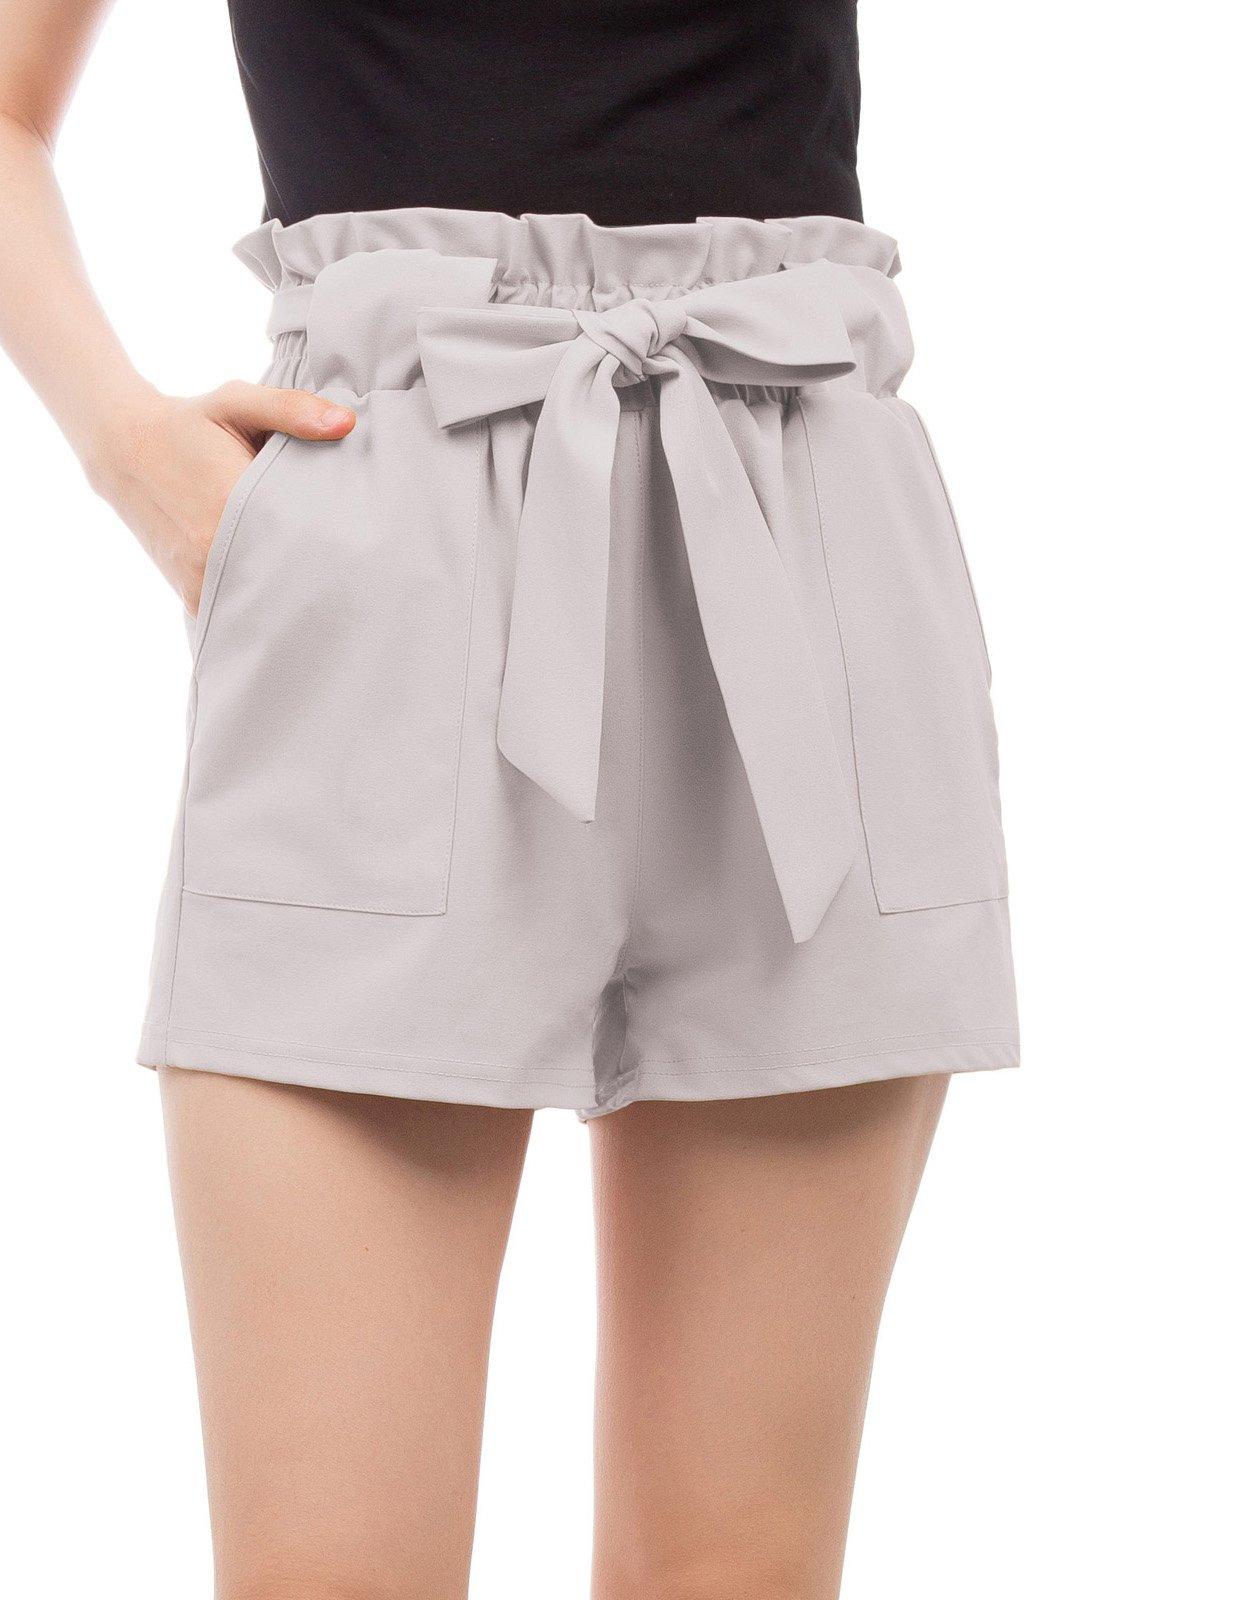 GRACE KARIN Women's High Waist Casual Frill Bowknot Shorts M Light Apricot